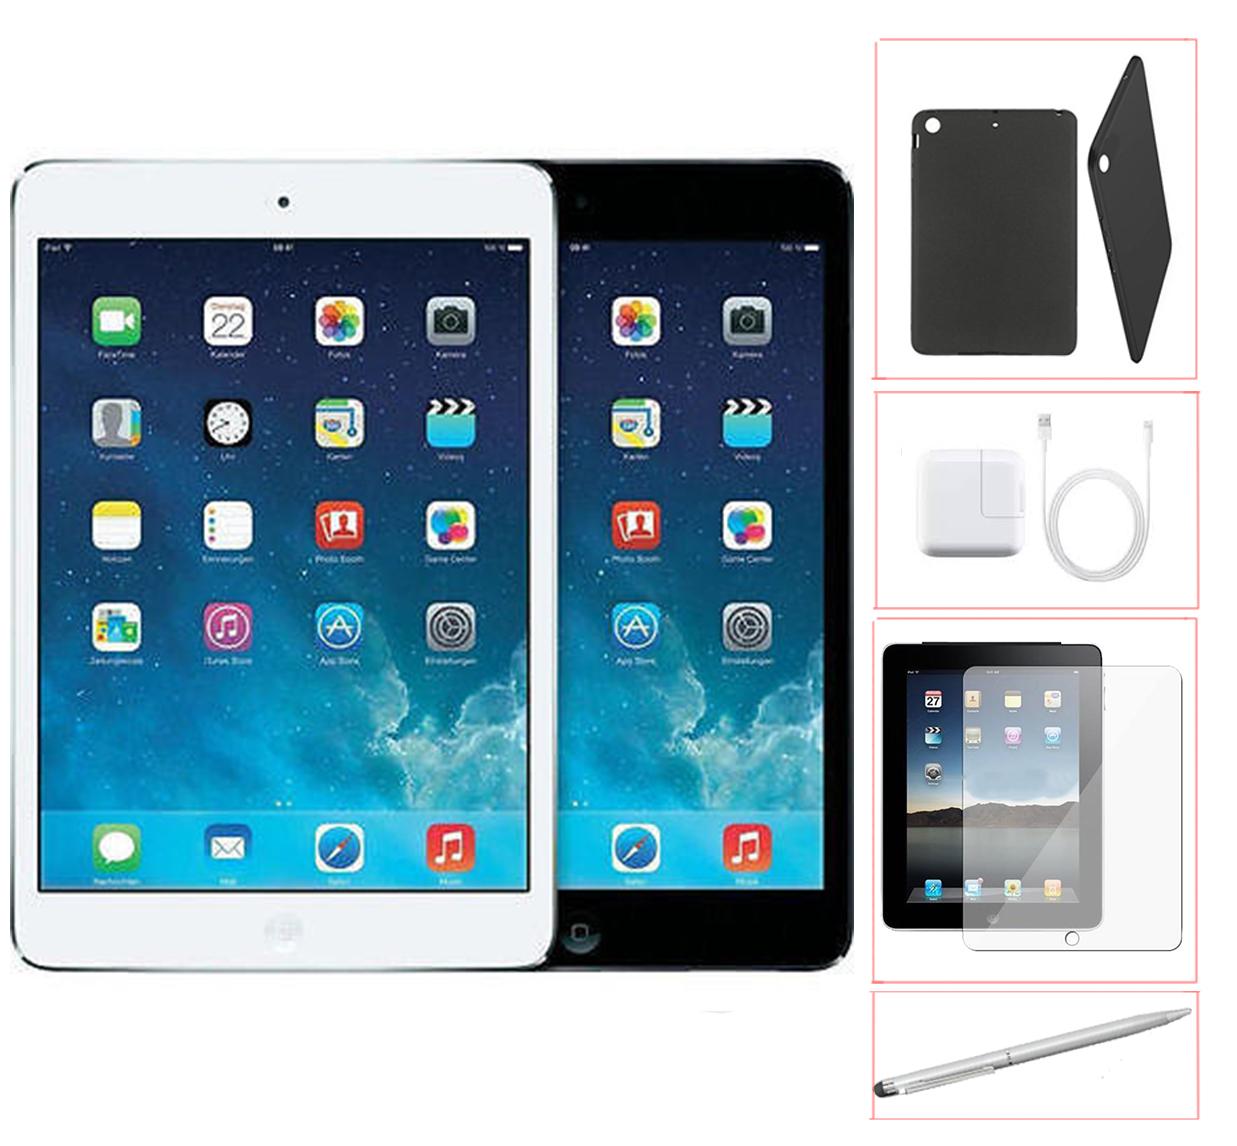 Refurbished Apple iPad Mini 32GB Black -WiFi - Bundle - Case, Rapid Charger, Tempered Glass & Stylus Pen